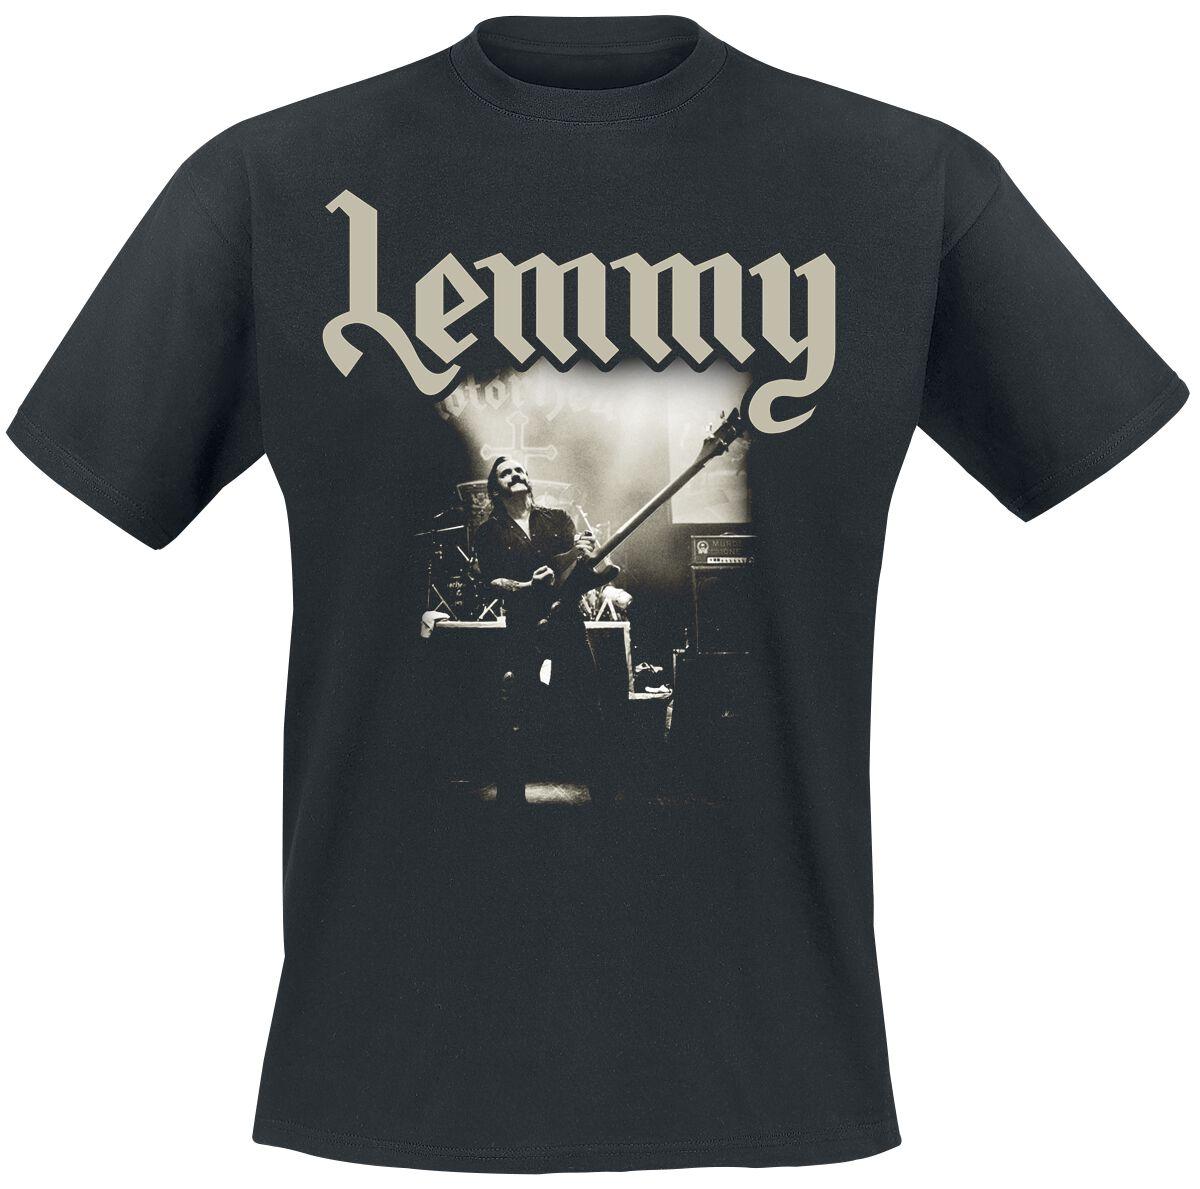 lemmy lived to win t shirt jetzt erh ltlich bei emp. Black Bedroom Furniture Sets. Home Design Ideas